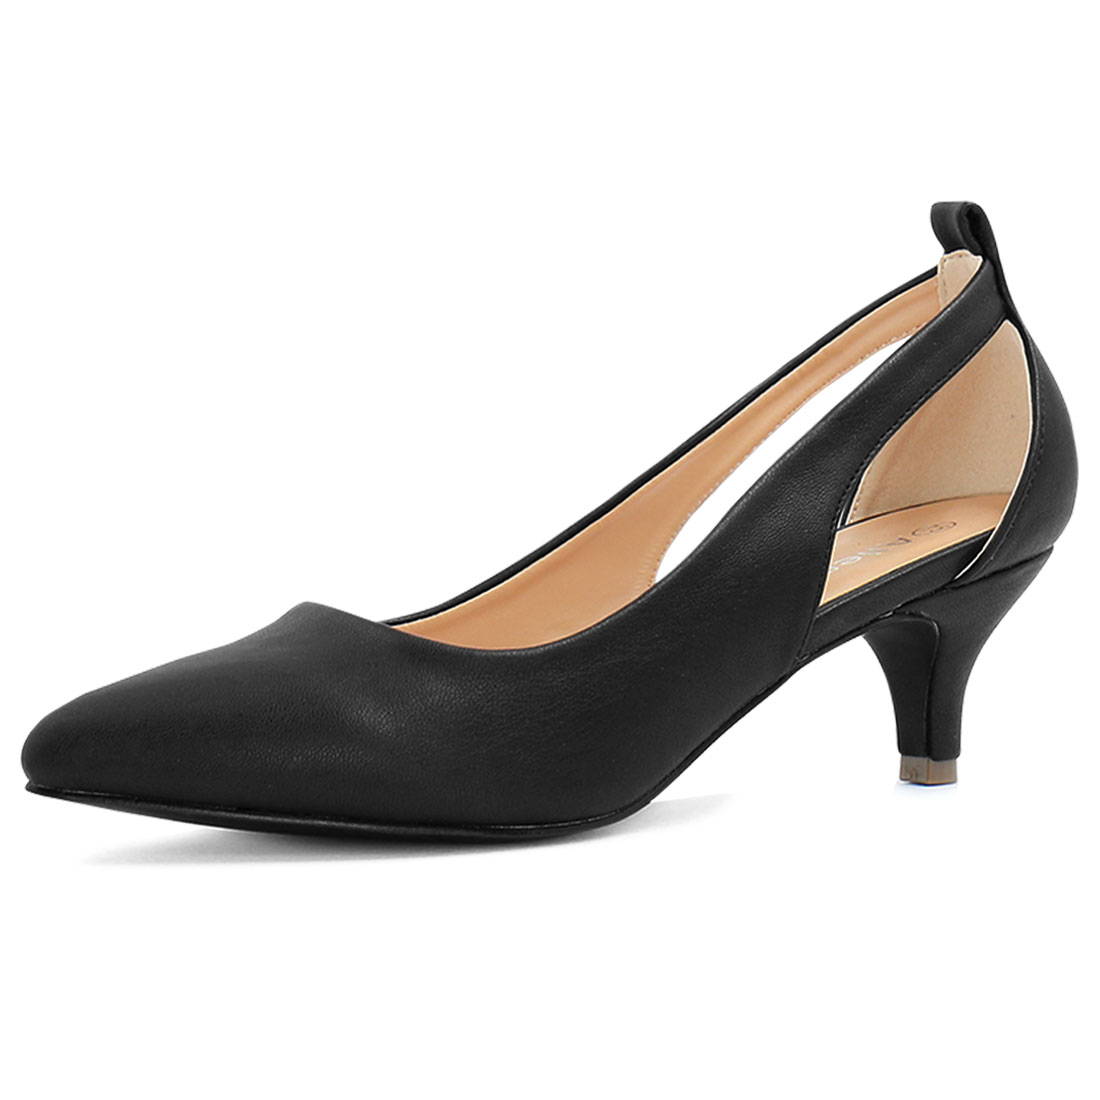 Allegra K Women's Cutout Sides Pointed Toe Kitten Heel Pumps Black US 9.5